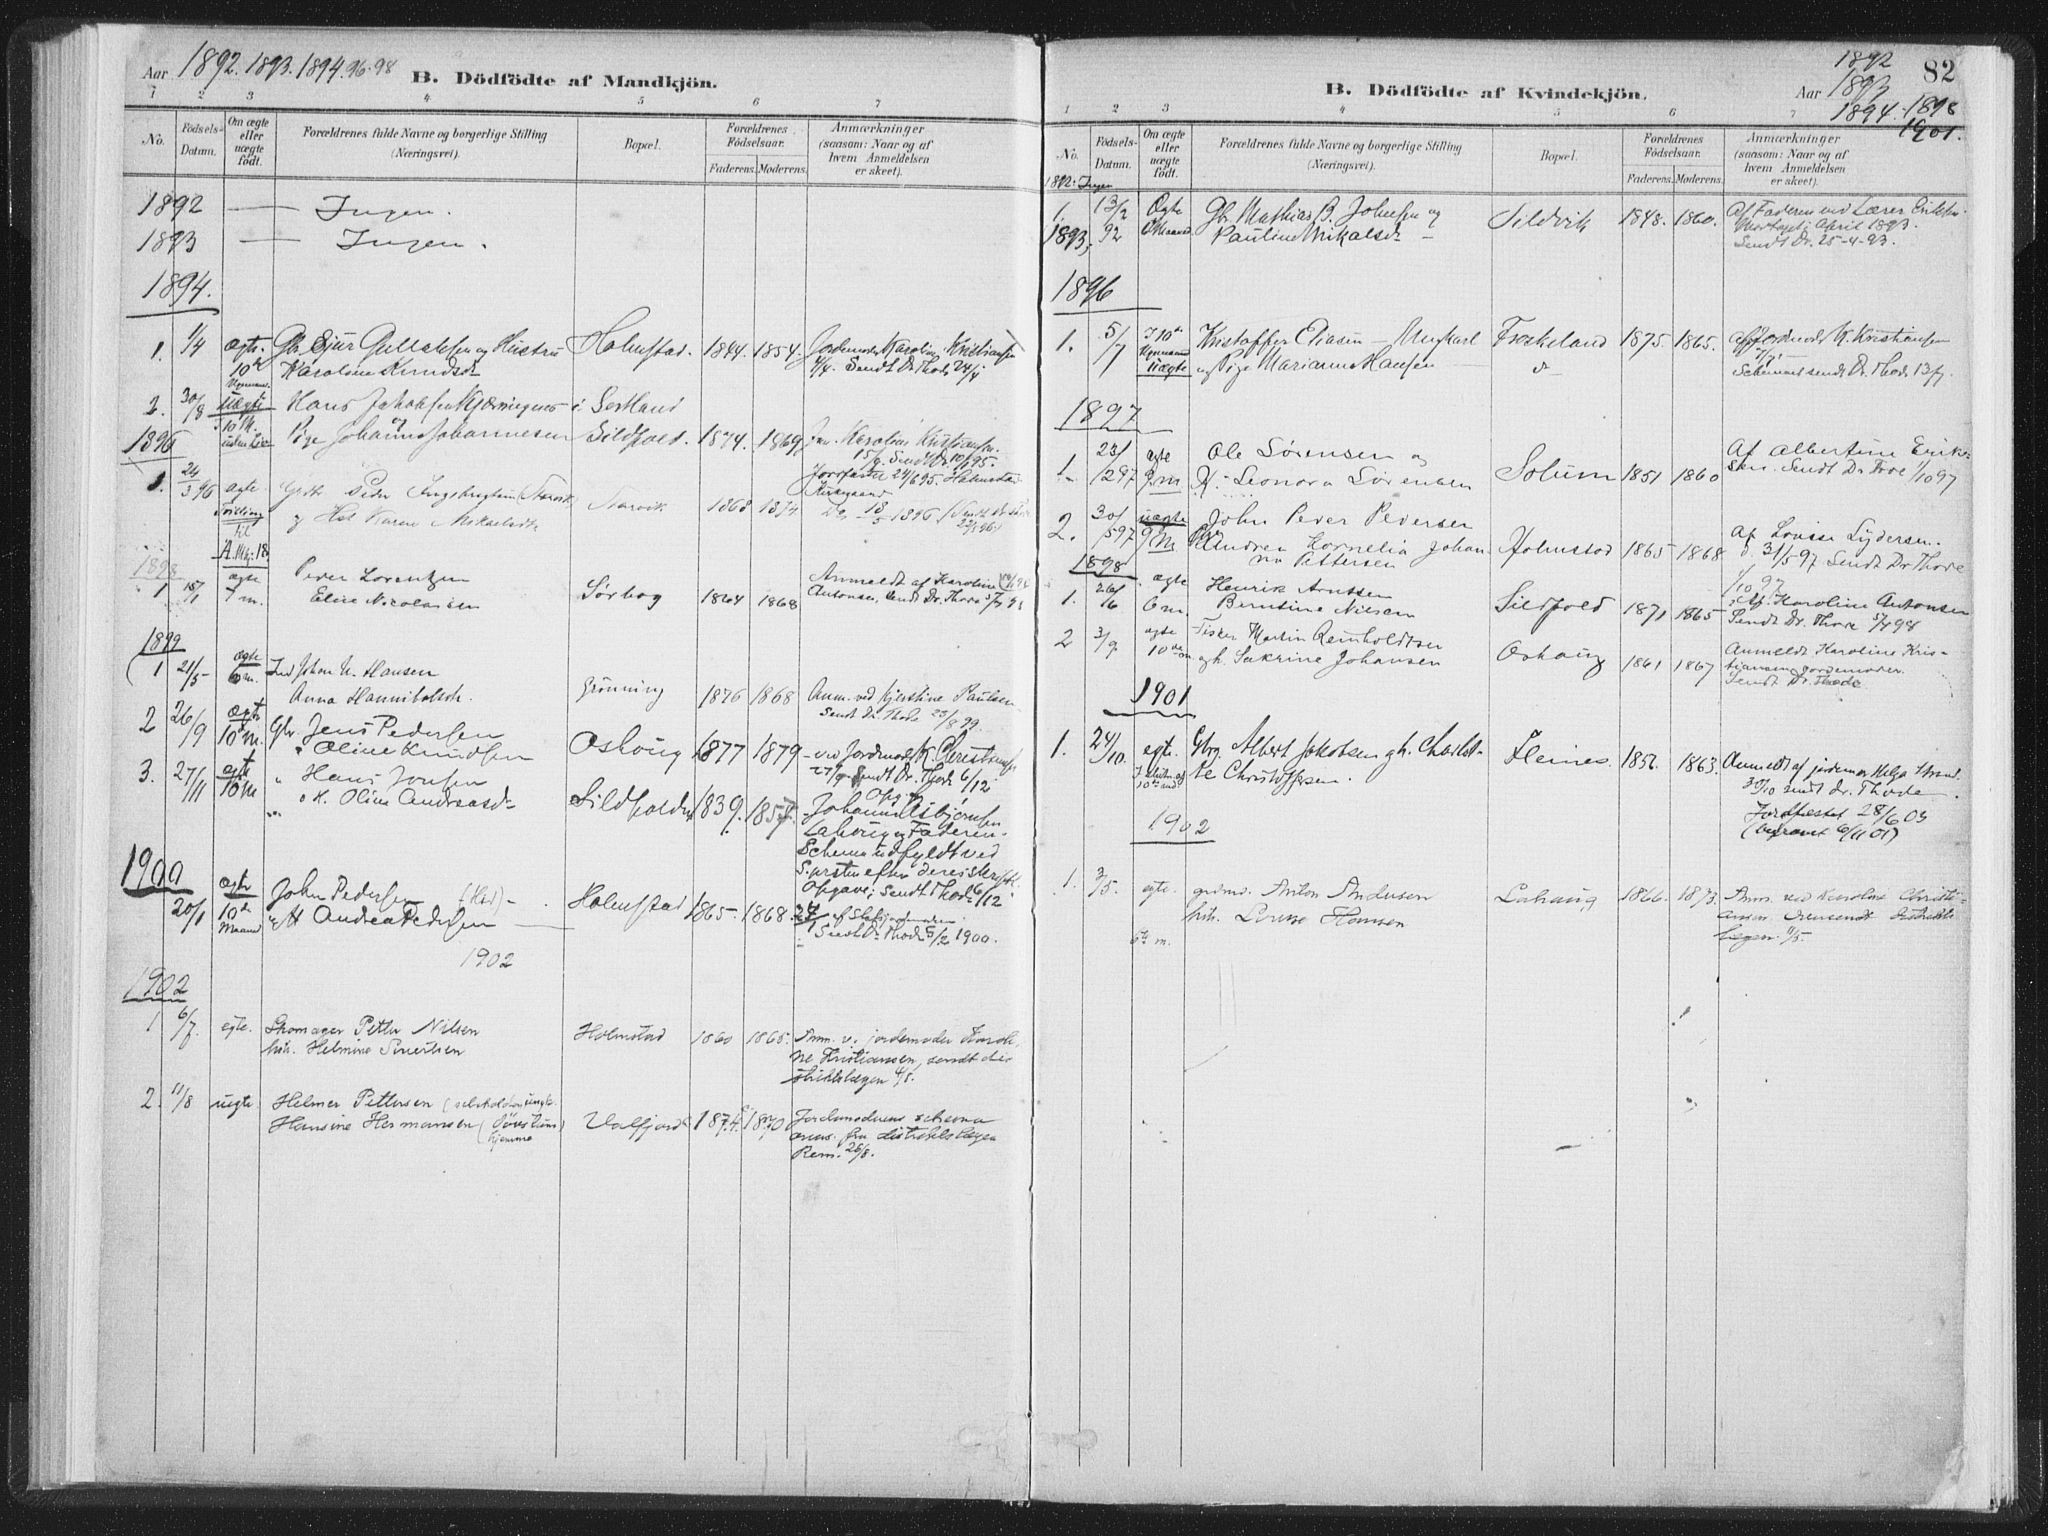 SAT, Ministerialprotokoller, klokkerbøker og fødselsregistre - Nordland, 890/L1286: Ministerialbok nr. 890A01, 1882-1902, s. 82